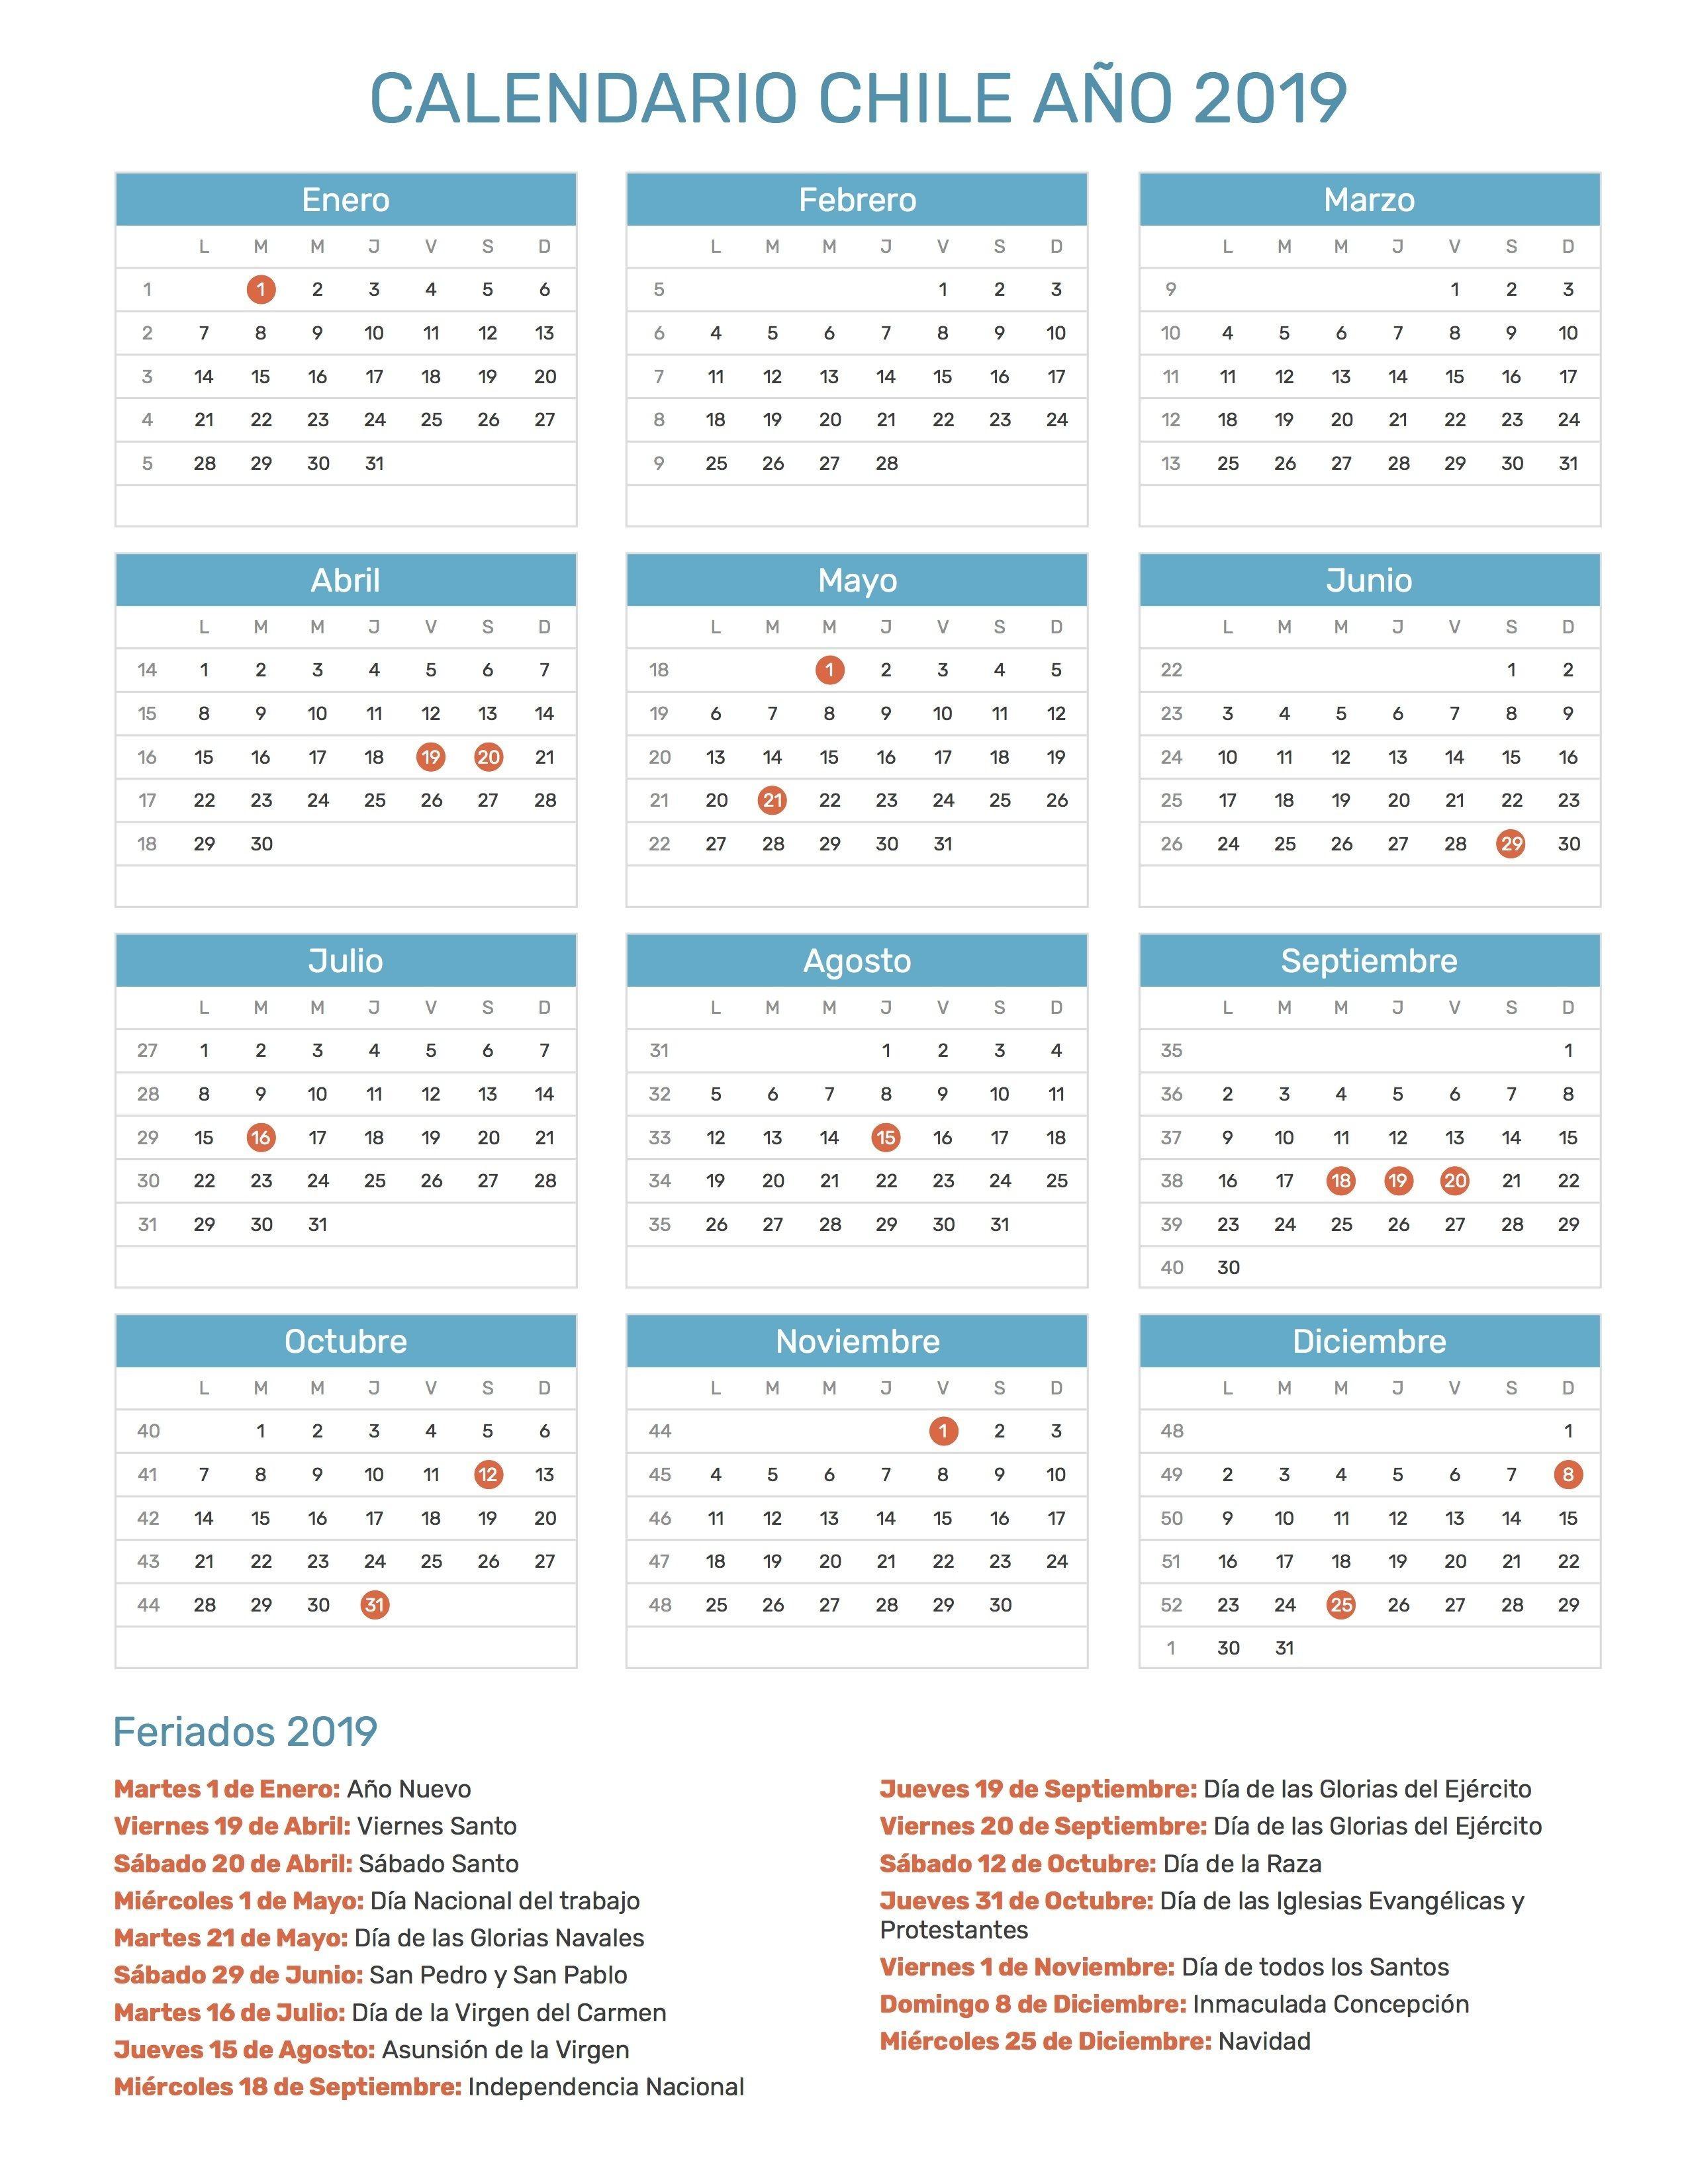 Calendario 2019 Chile Calendario 2019 Chile Calendar Pdf Journal